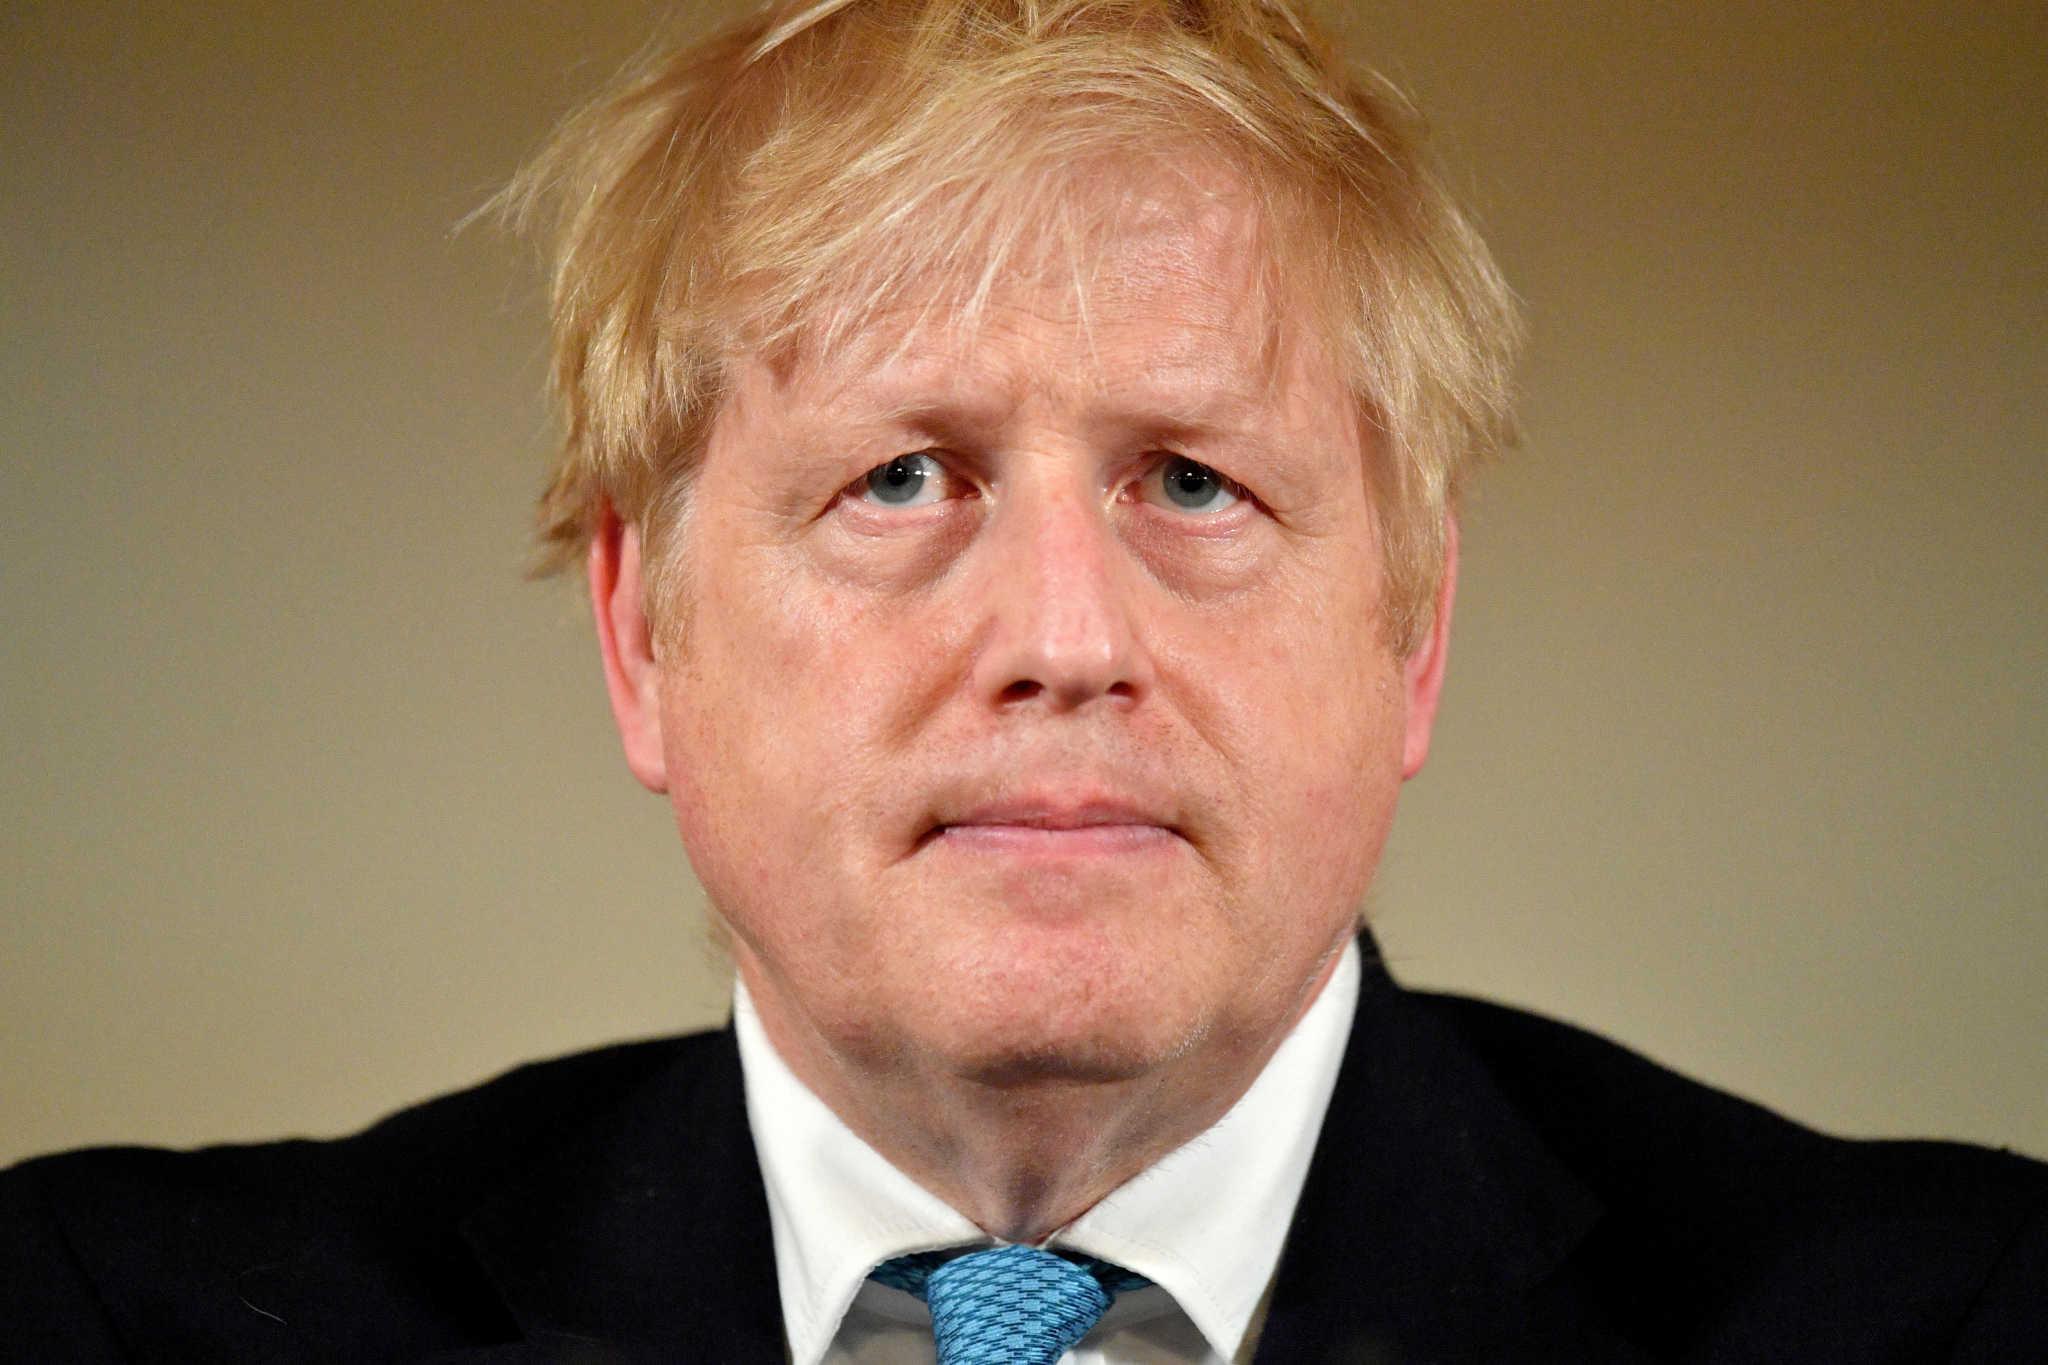 FILE PHOTO: British Prime Minister Boris Johnson looks on during a coronavirus disease (COVID-19) news conference inside 10 Downing Street, London, Britain March 19, 2020.  Leon Neal/Pool via REUTERS/File Photo